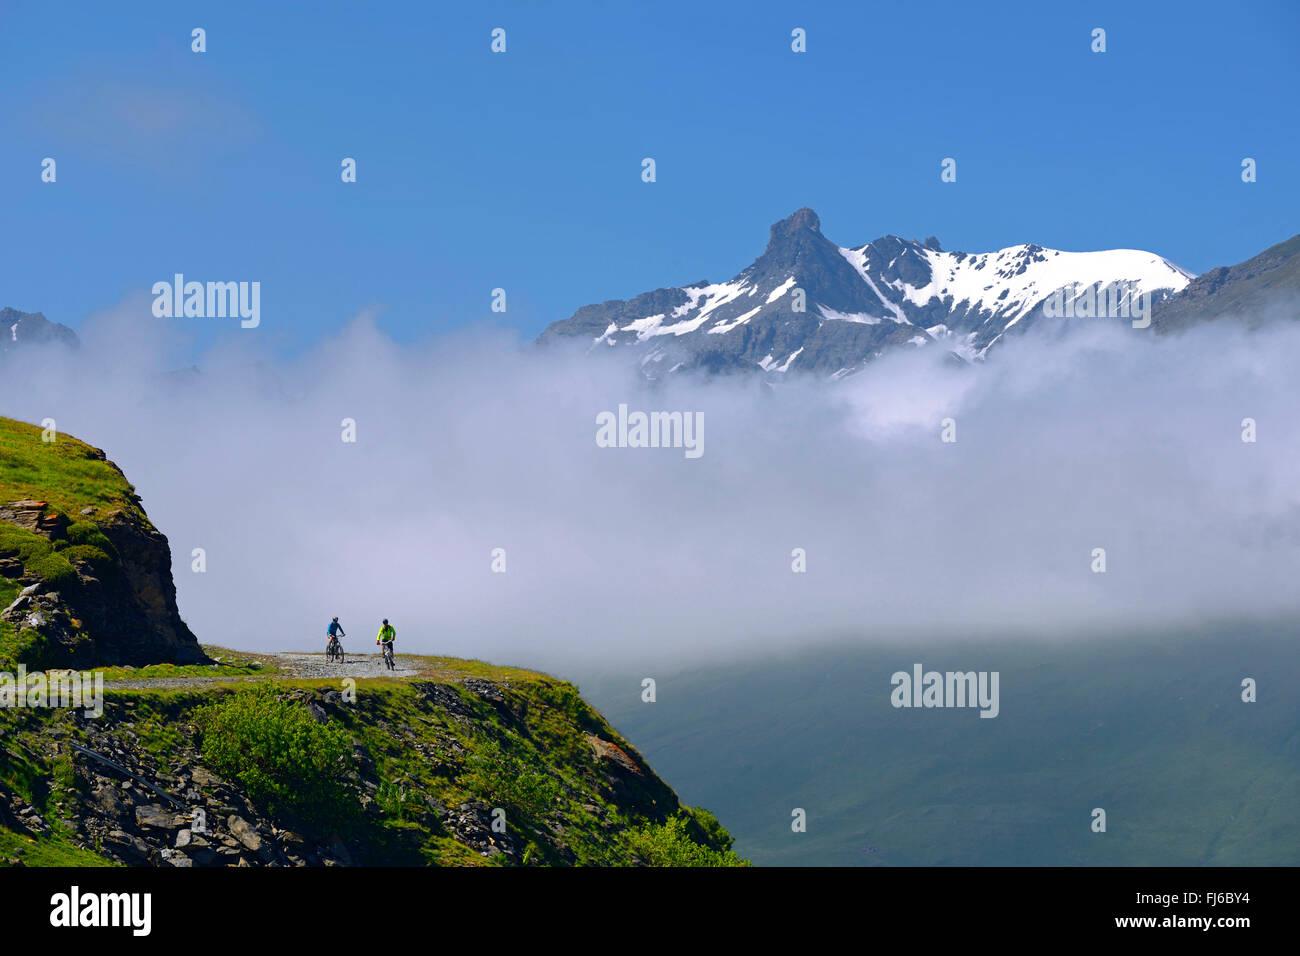 Mountain biking around Alp lake Lac du Mont Cenis, France, Savoie - Stock Image